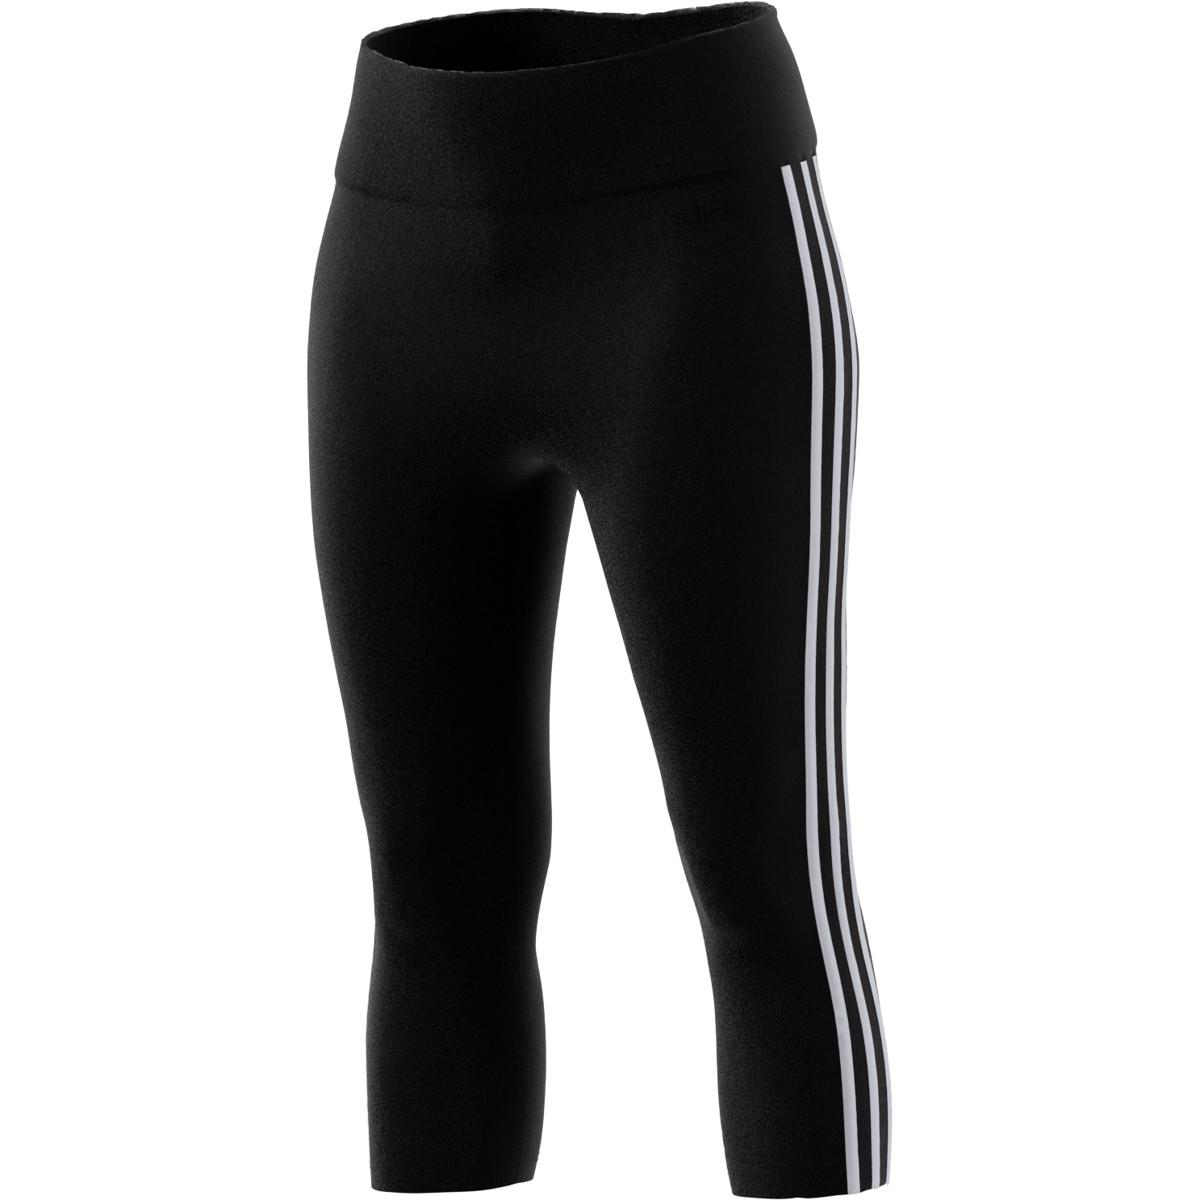 Adidas 3S Capri Tight WOMENS BK